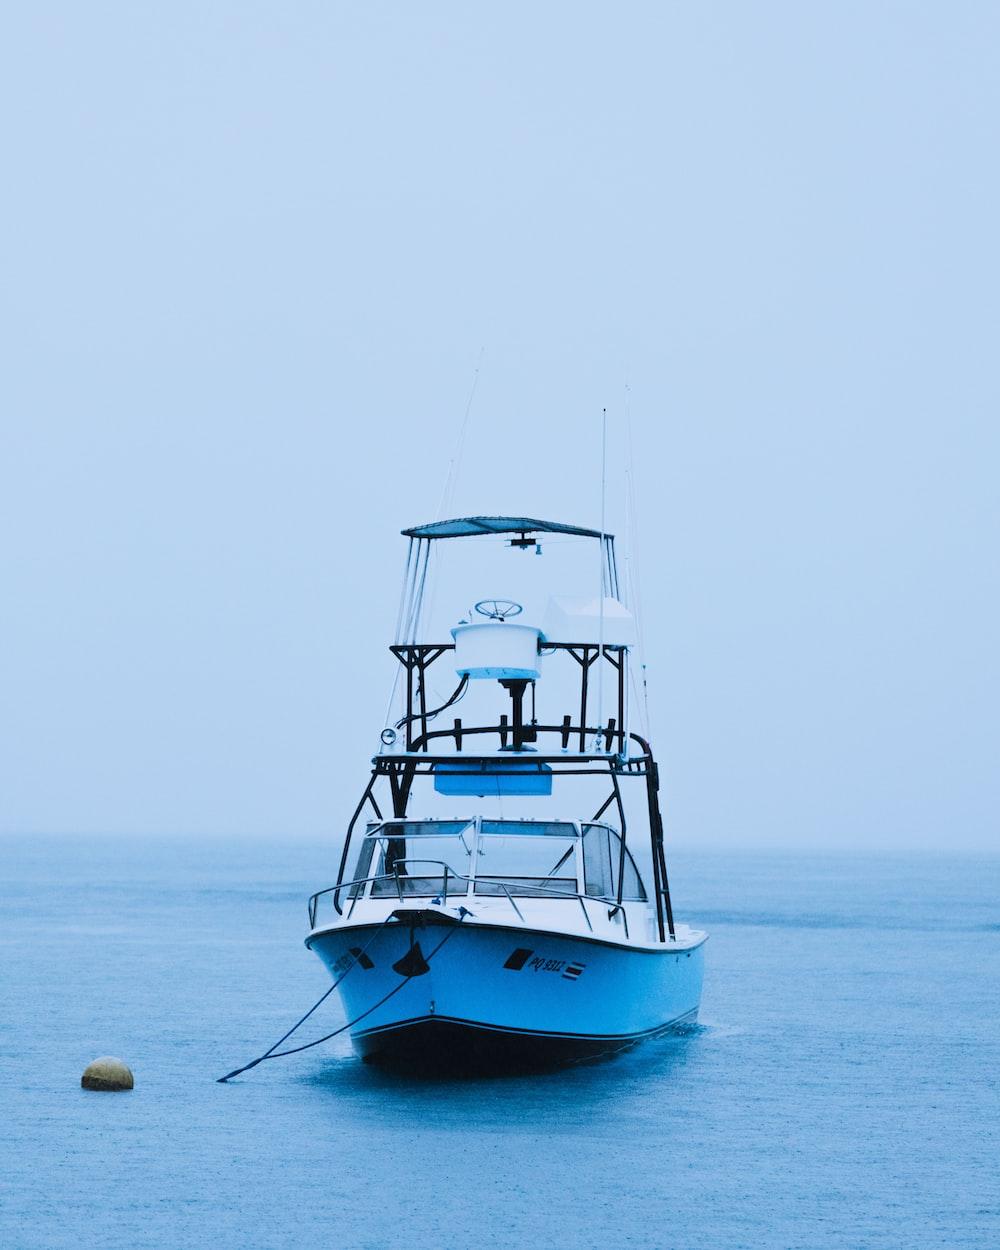 photo of white boat